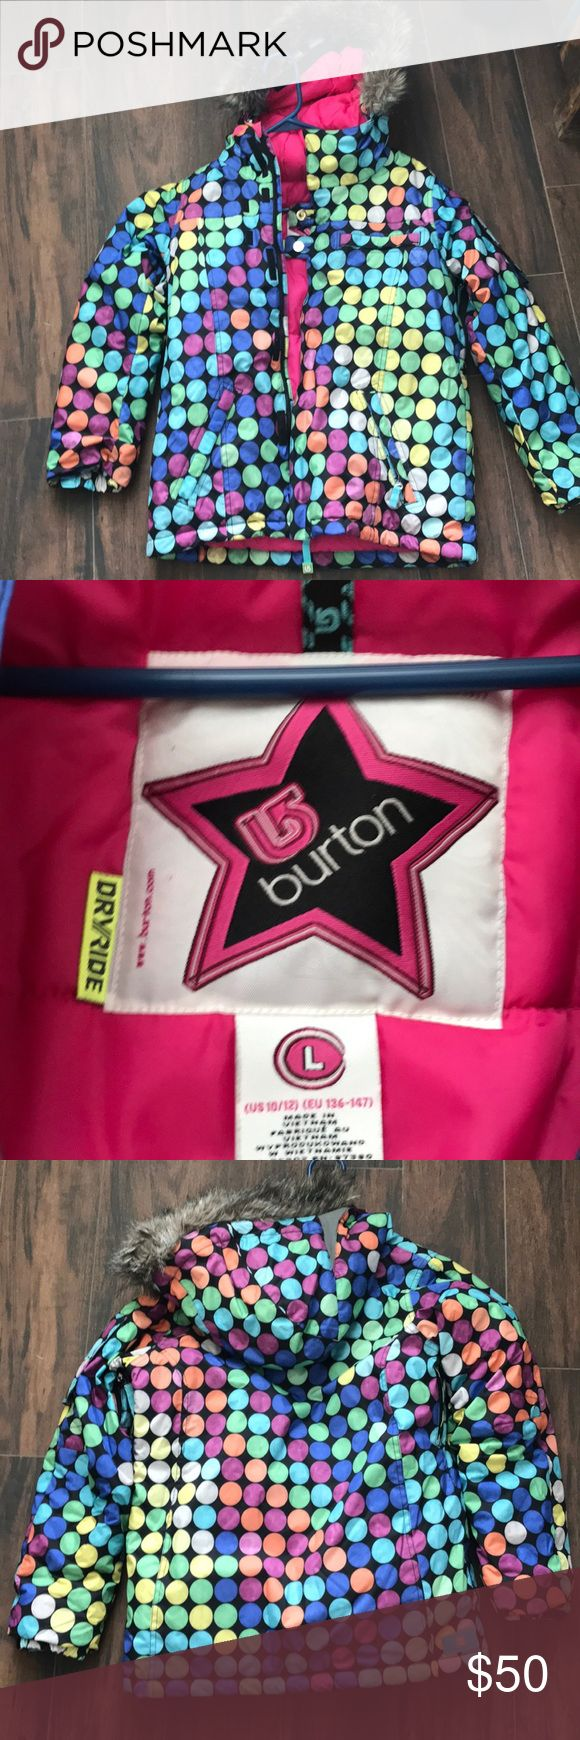 Ski jacket Girls Burton ski jacket. Like new. Worn 1 Day!!! Size 10-12 burton Jackets & Coats Puffers